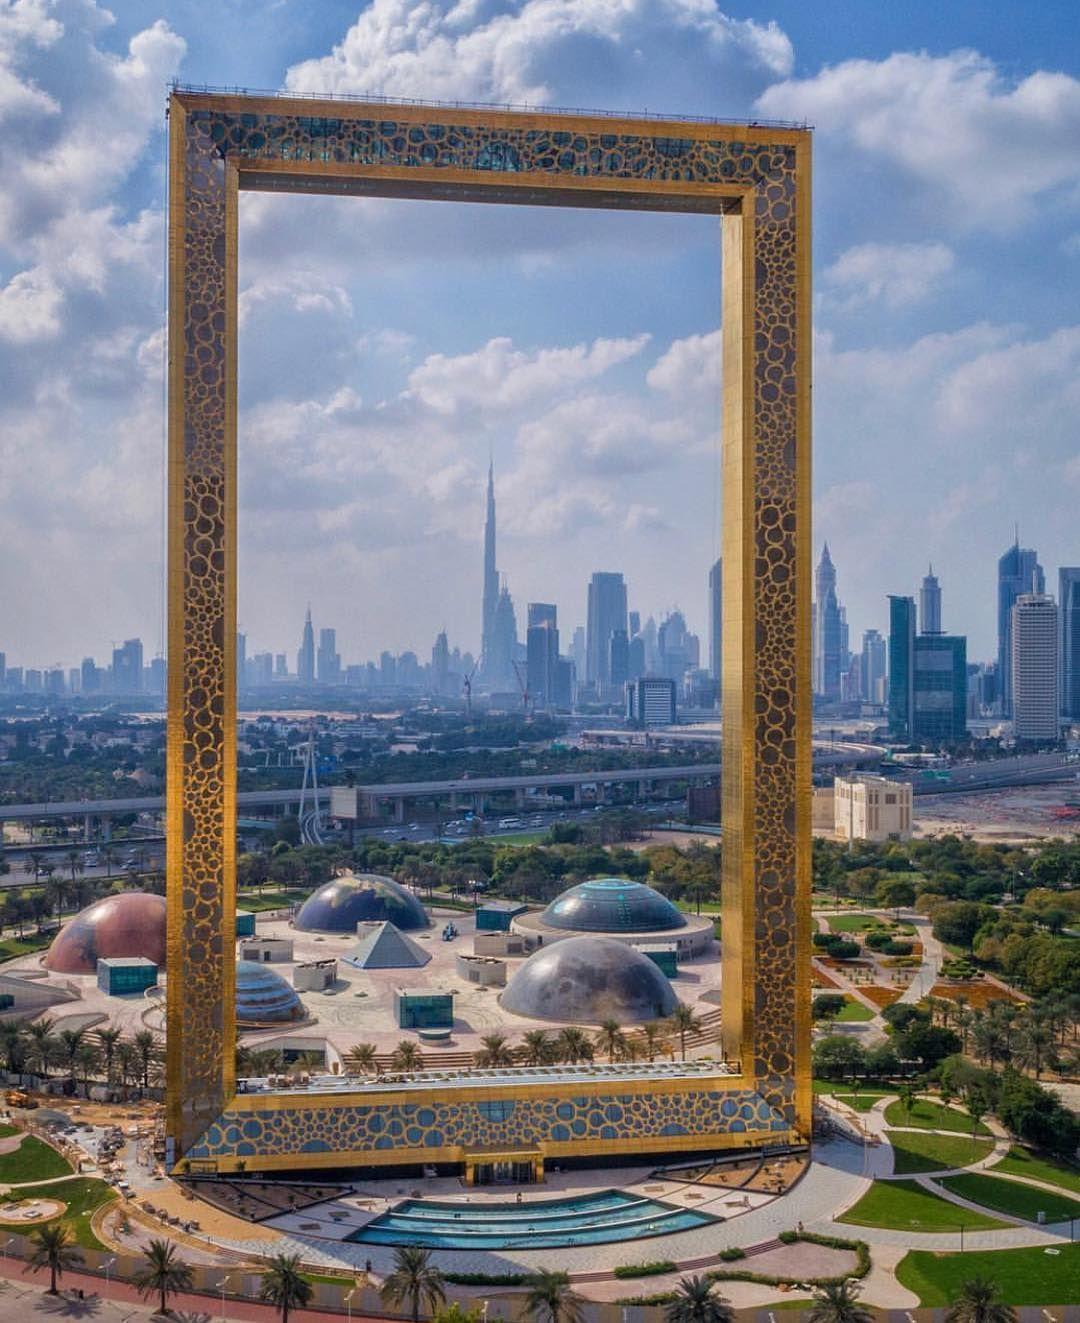 Fame Dubai Home Famedubai Magazine Your Daily Dose Of Lifestyle Shopping Trends In Uae Dubai Travel Visit Dubai Dubai